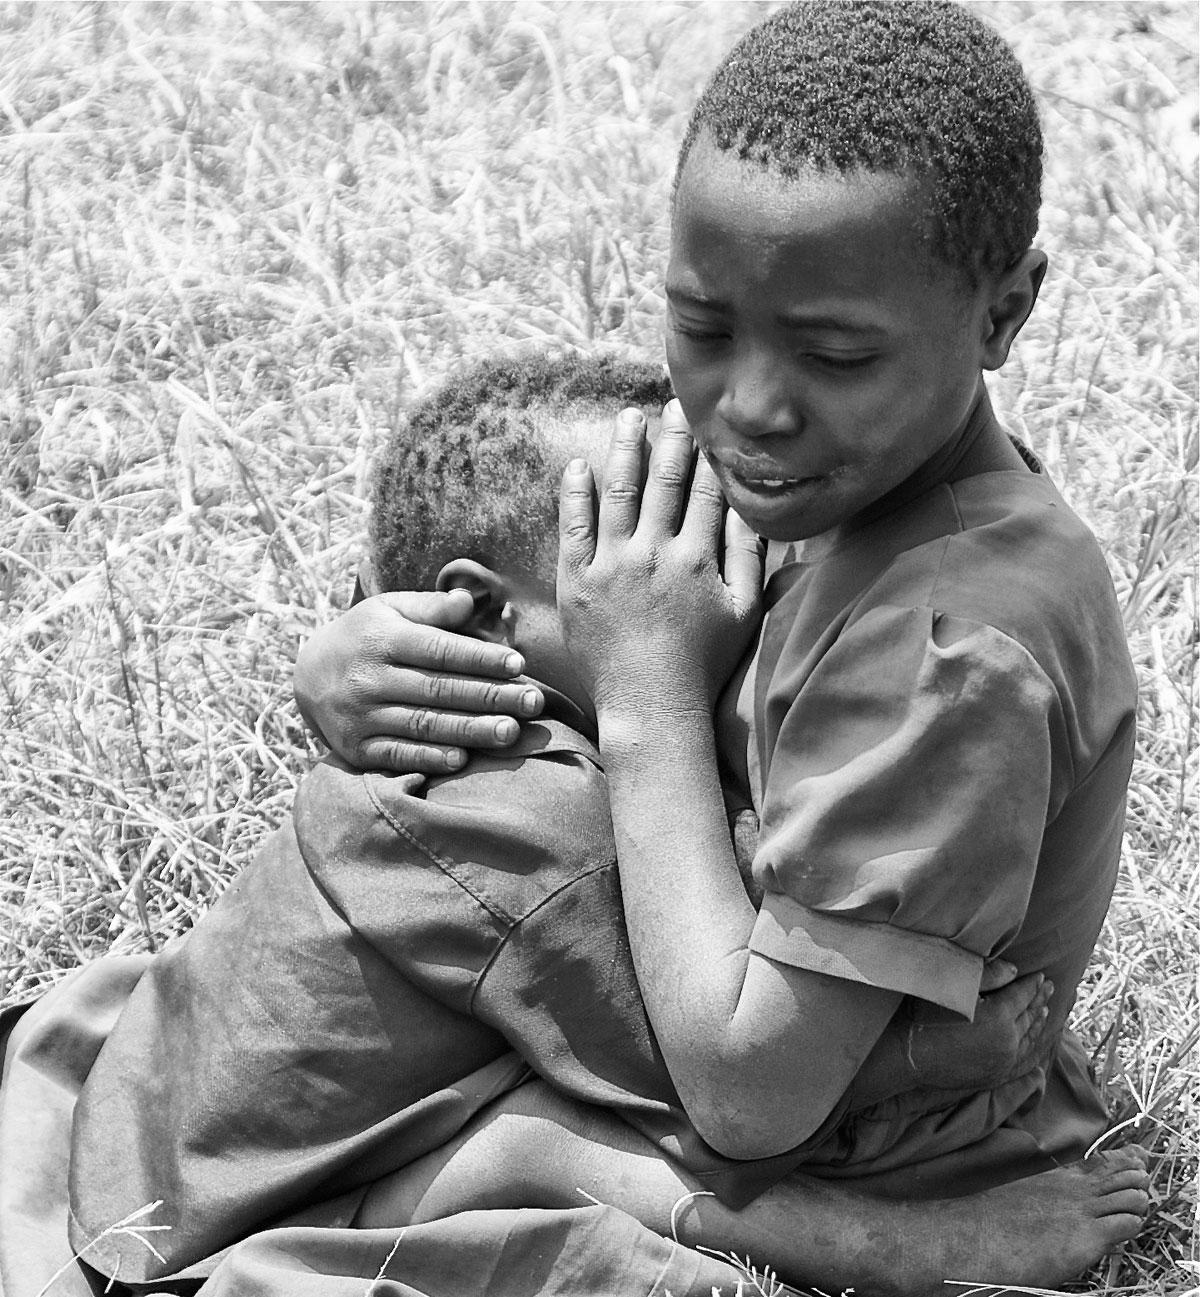 uganda_031_SP